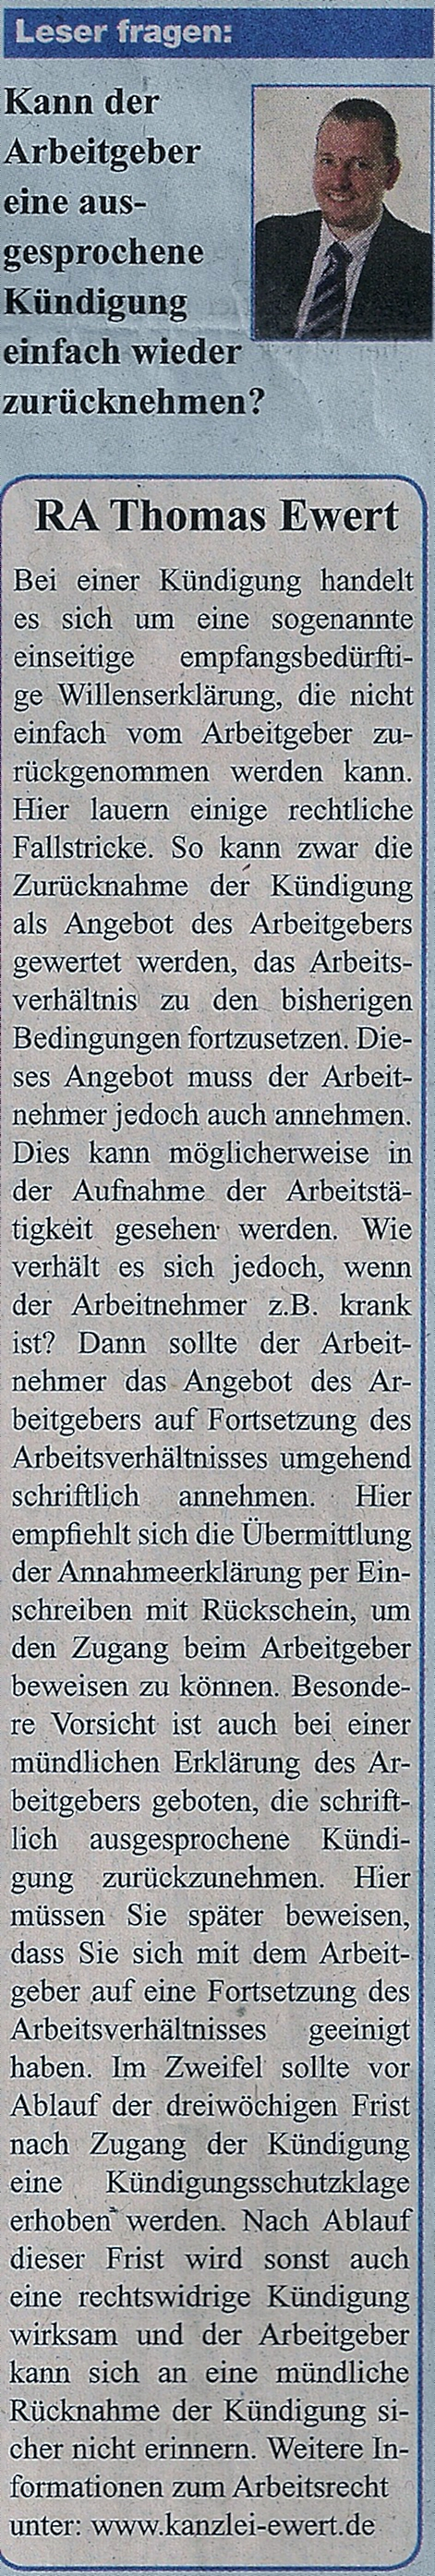 Rechtsanwalt Thomas Ewert Kann Der Arbeitgeber Eine